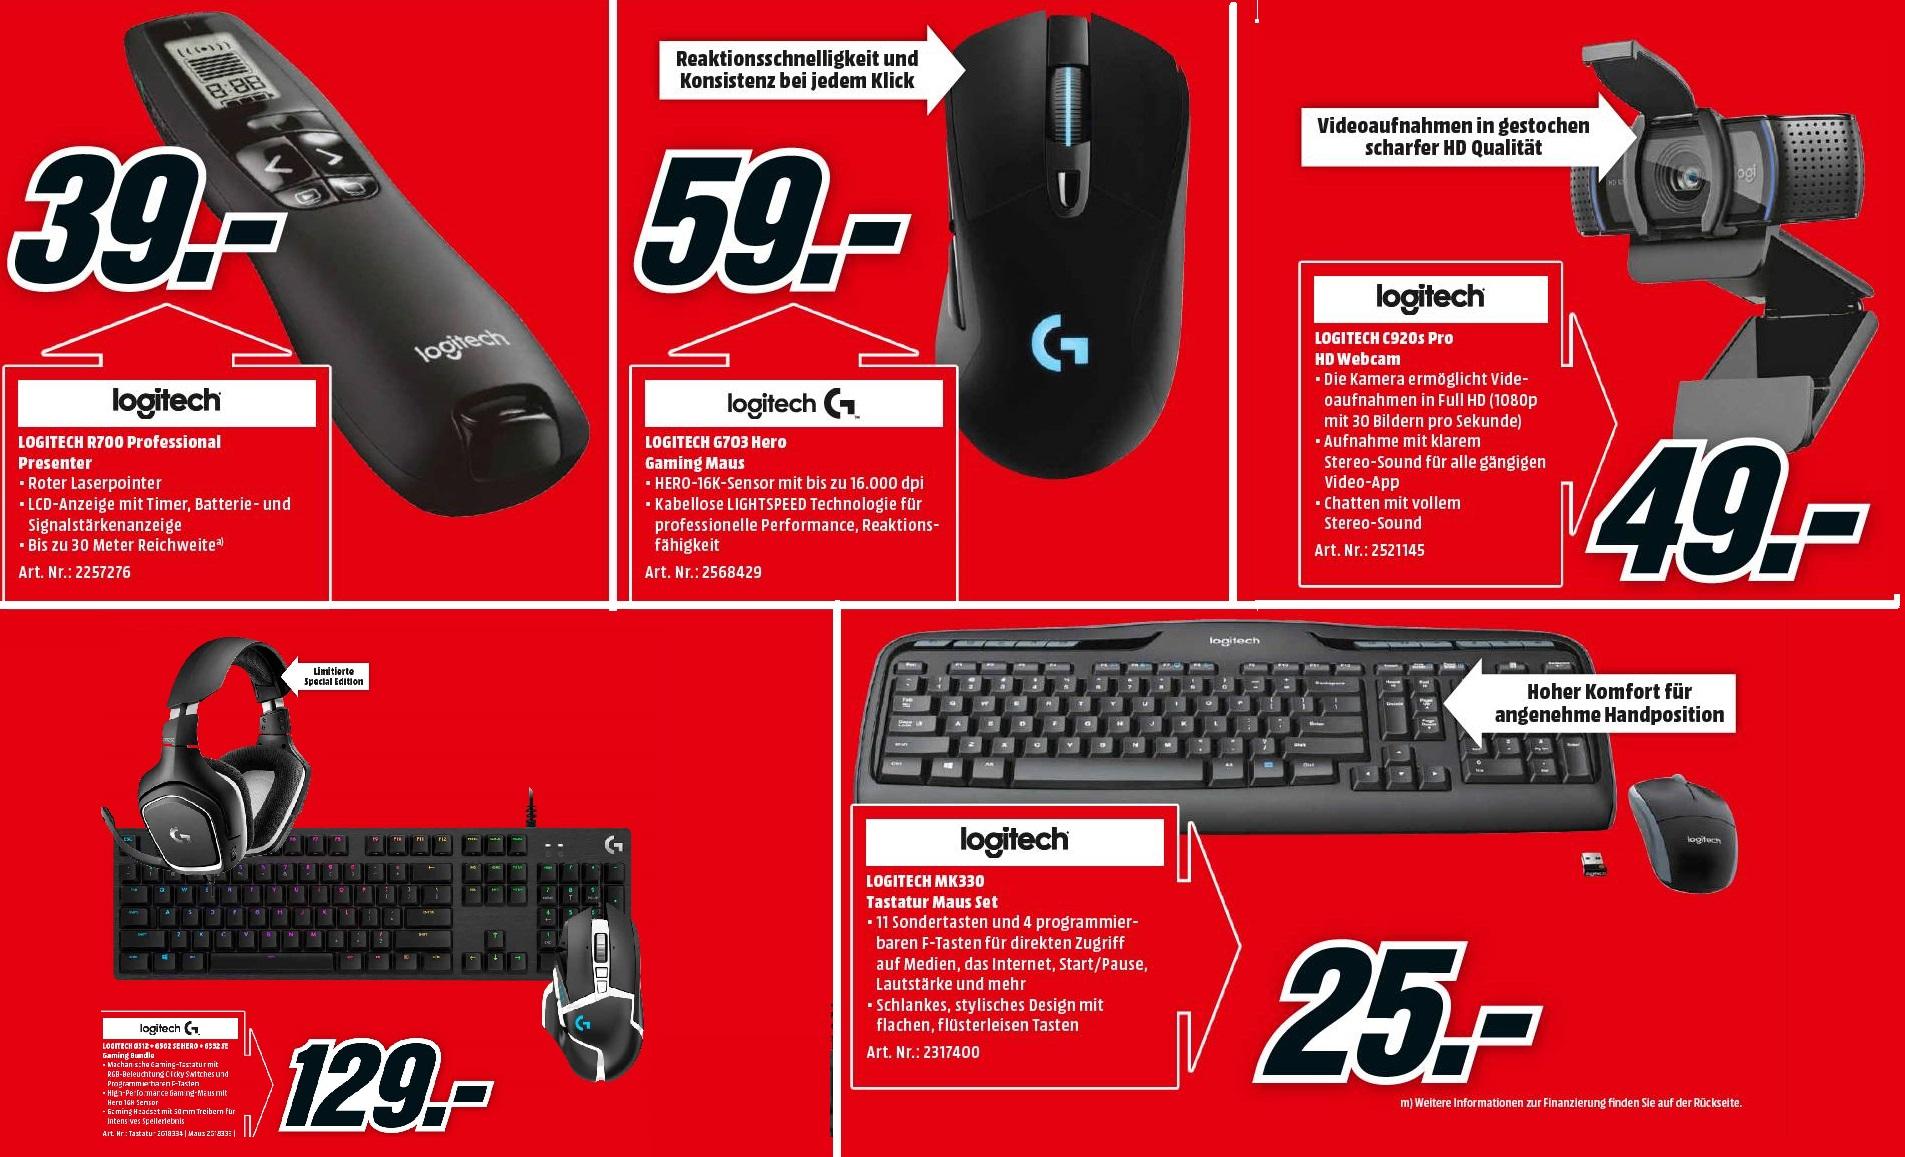 [Logitech] G703 Hero Wireless Gaming Maus =59€   R700 Presenter =39€   C920s Kamera =49€   MK330 Wireless Set =25€   G502+G332+G512 SE =129€